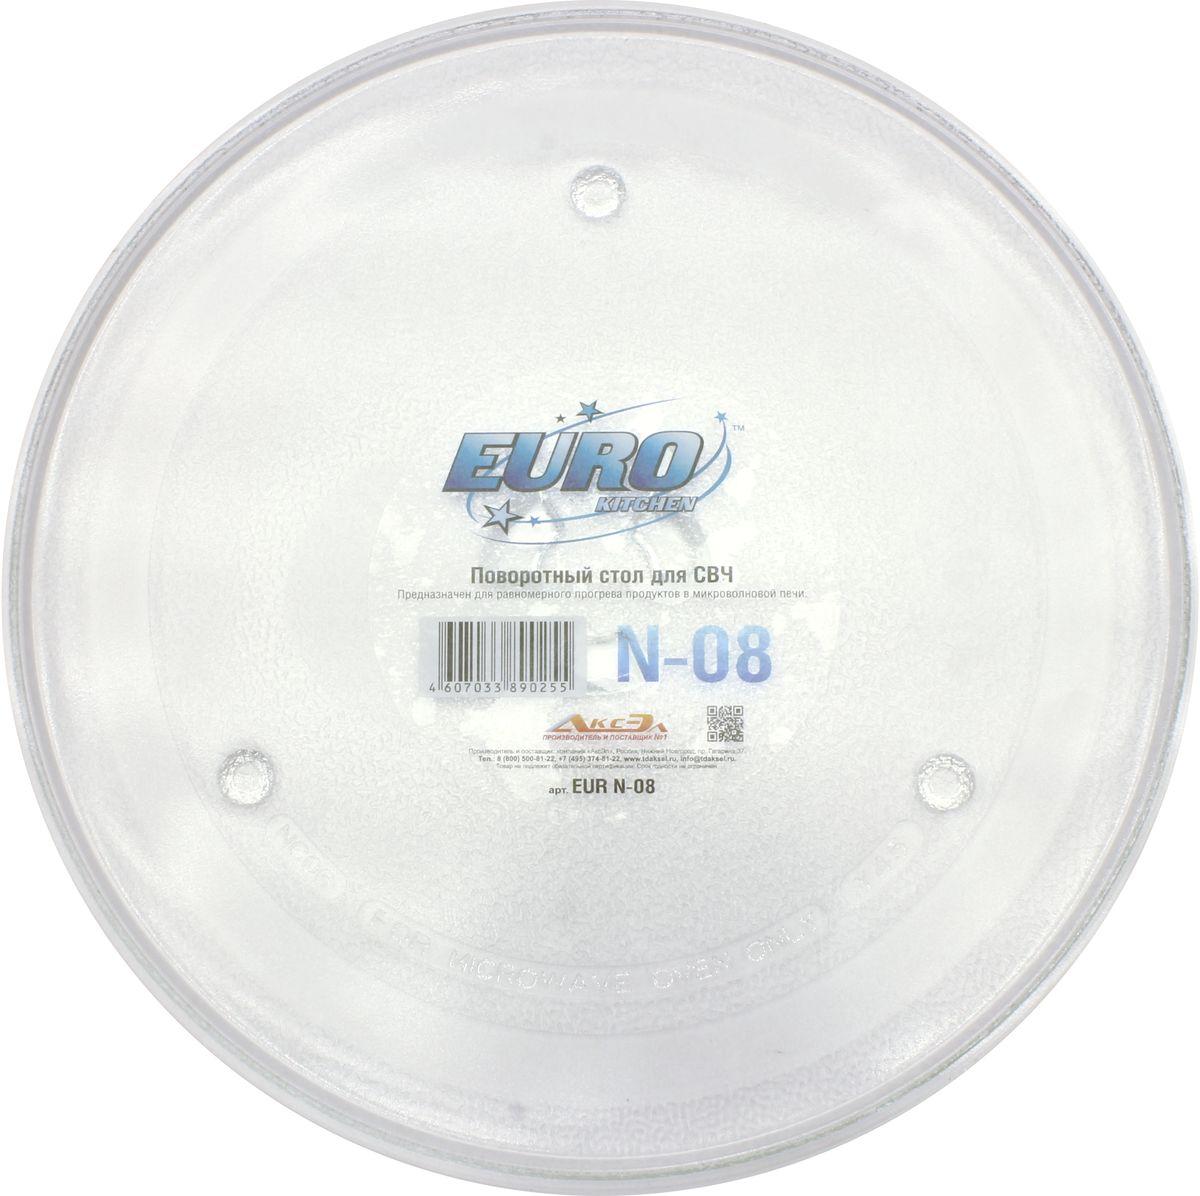 Euro Kitchen N-08 тарелка для СВЧ посуда для микроволновой печи пласттим pt1674